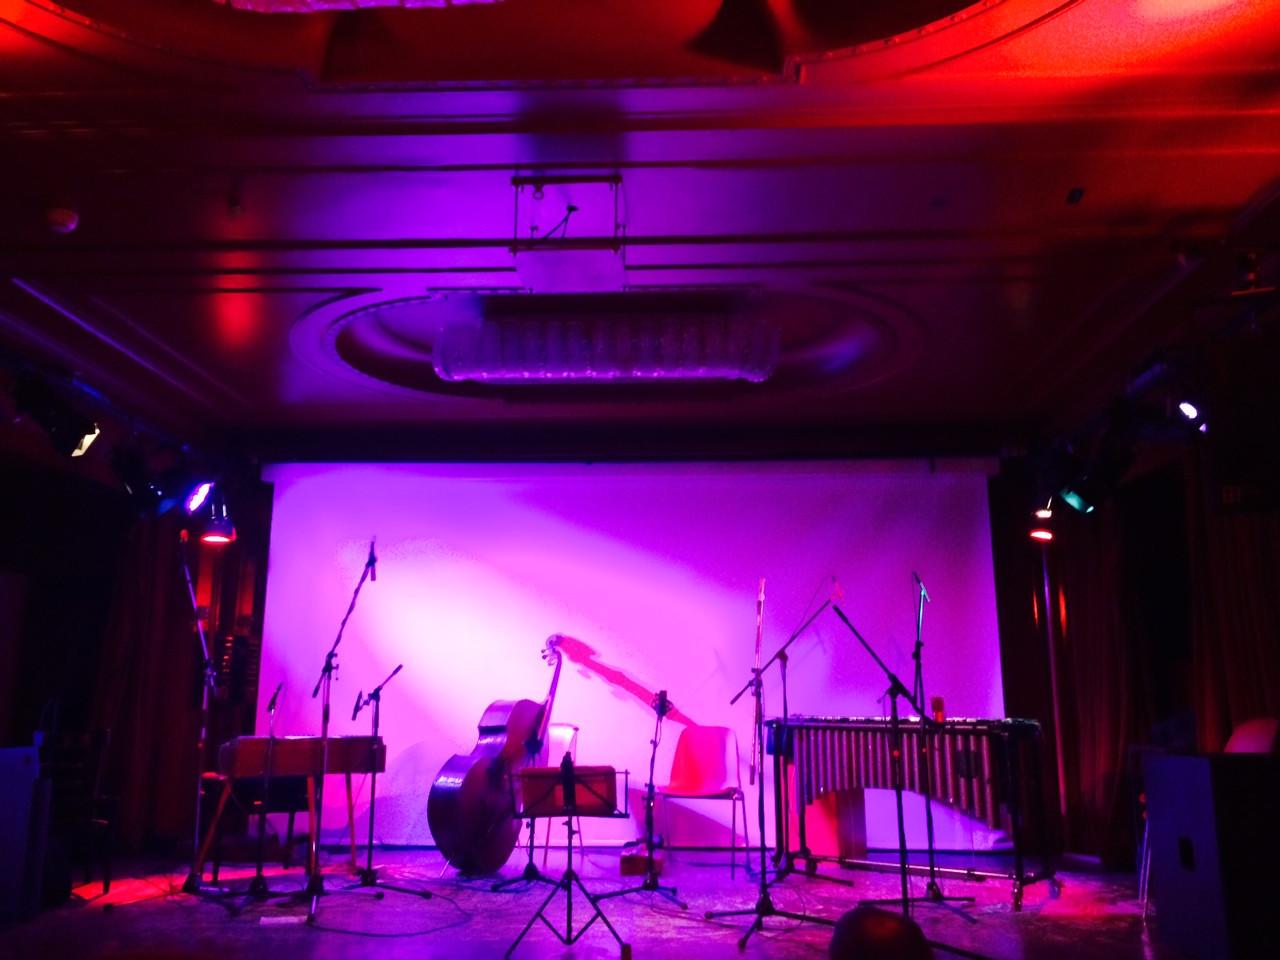 Roter Salon concert place Berlin